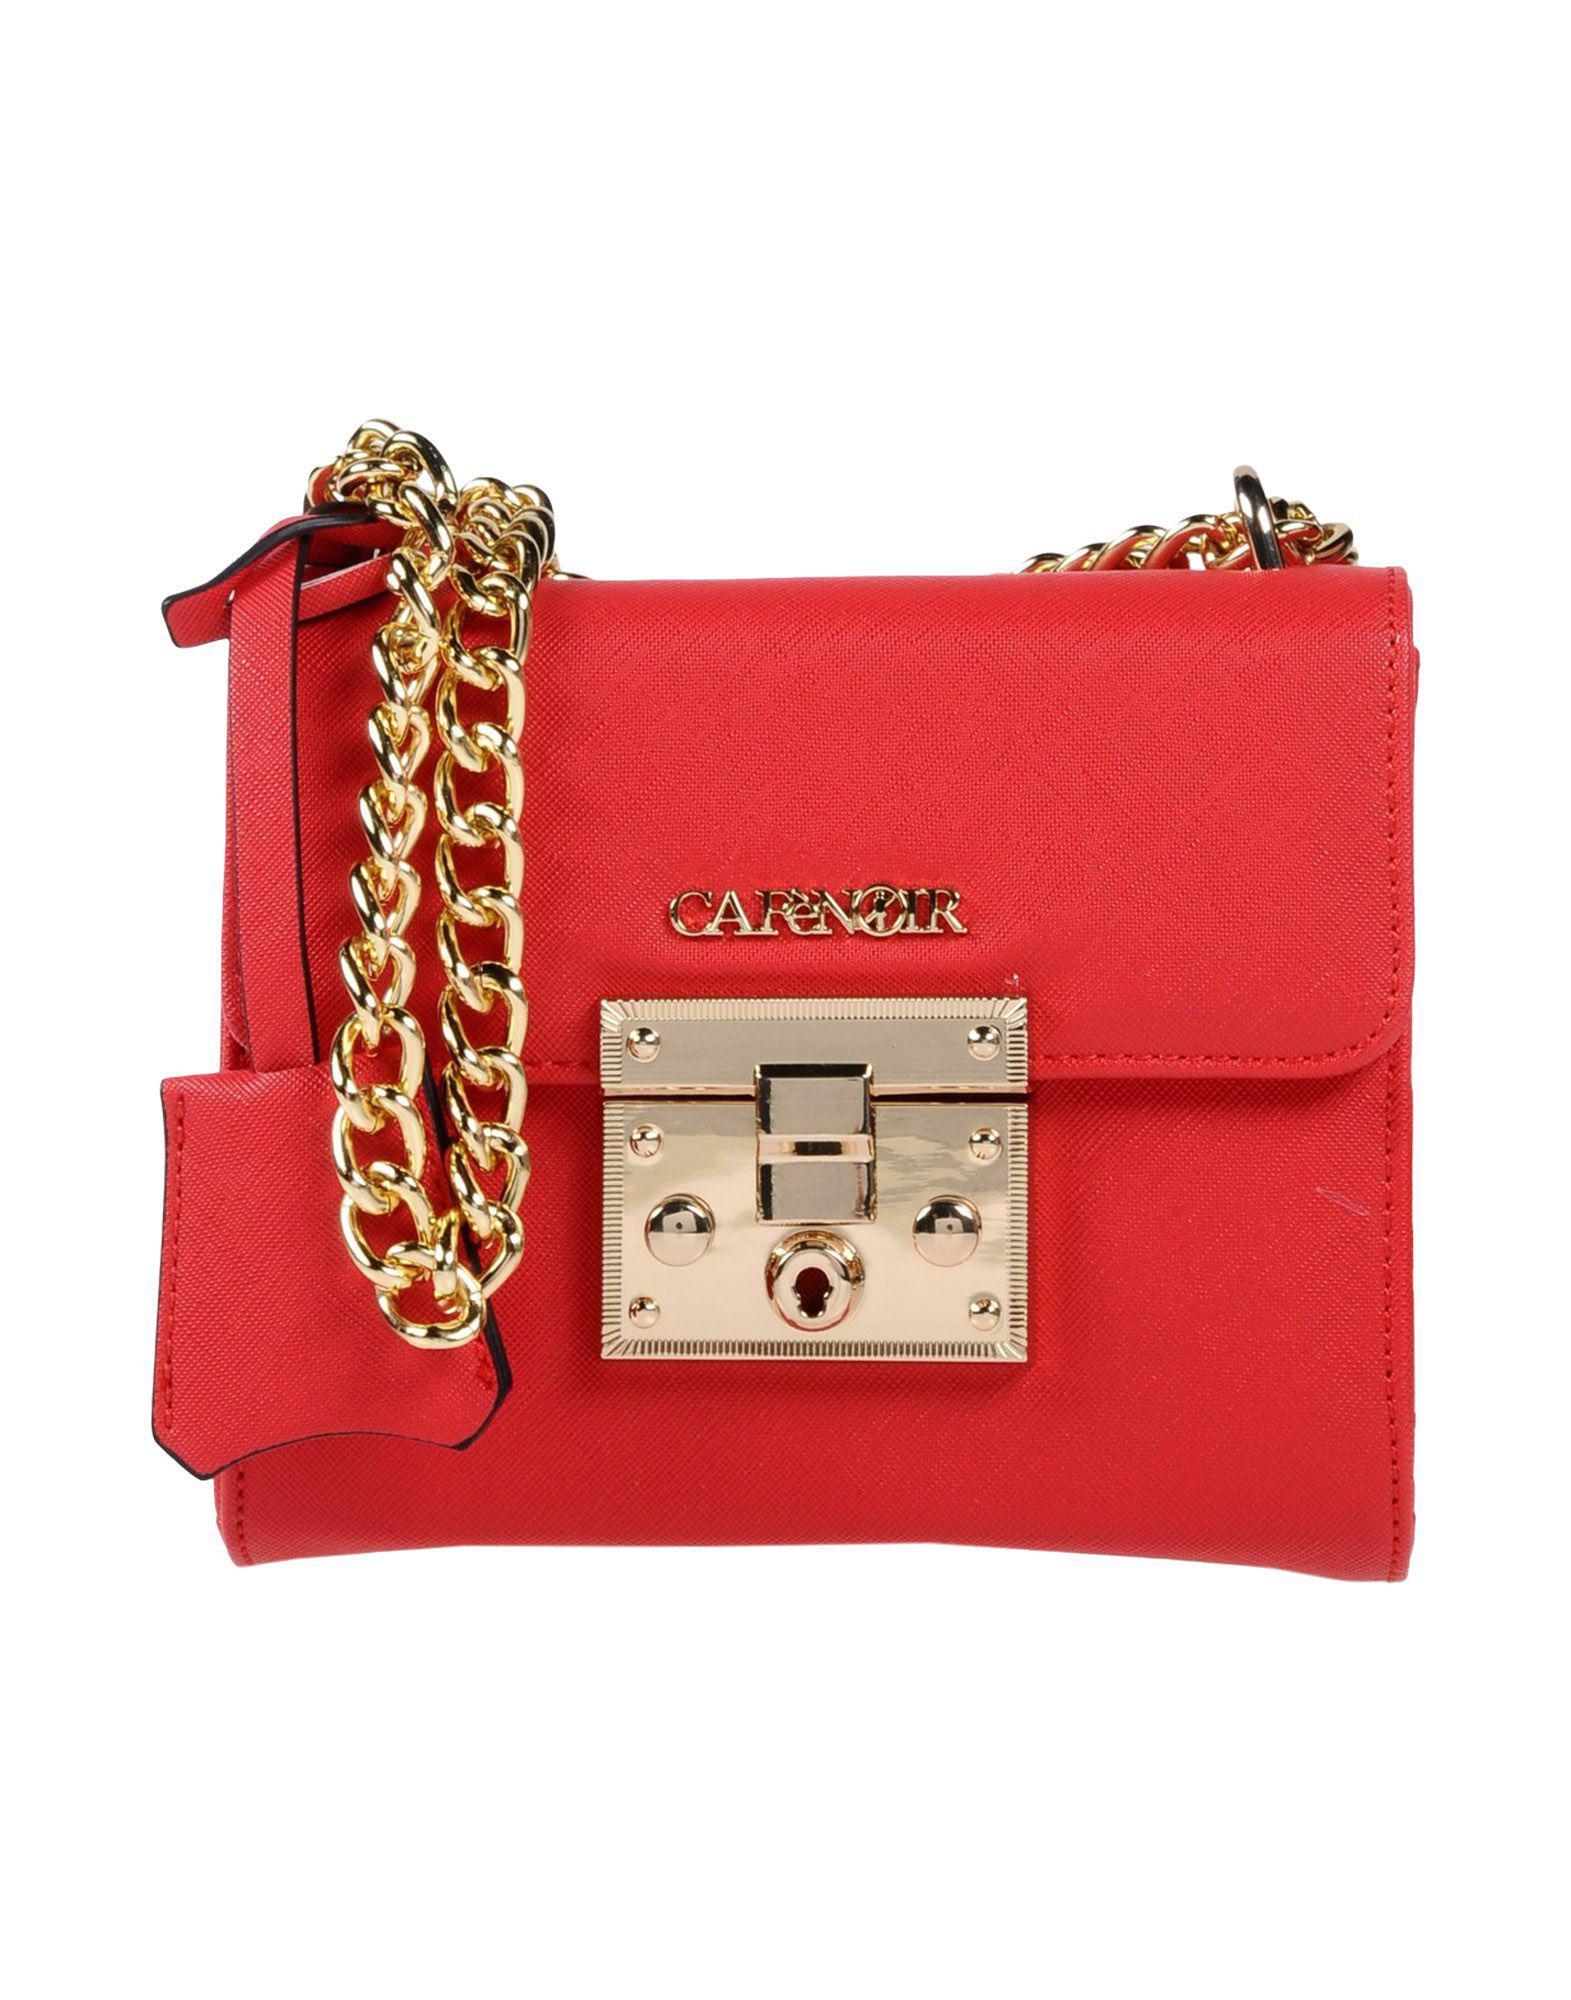 HANDBAGS - Cross-body bags Cafènoir Discount 100% Original 9fWa3cH